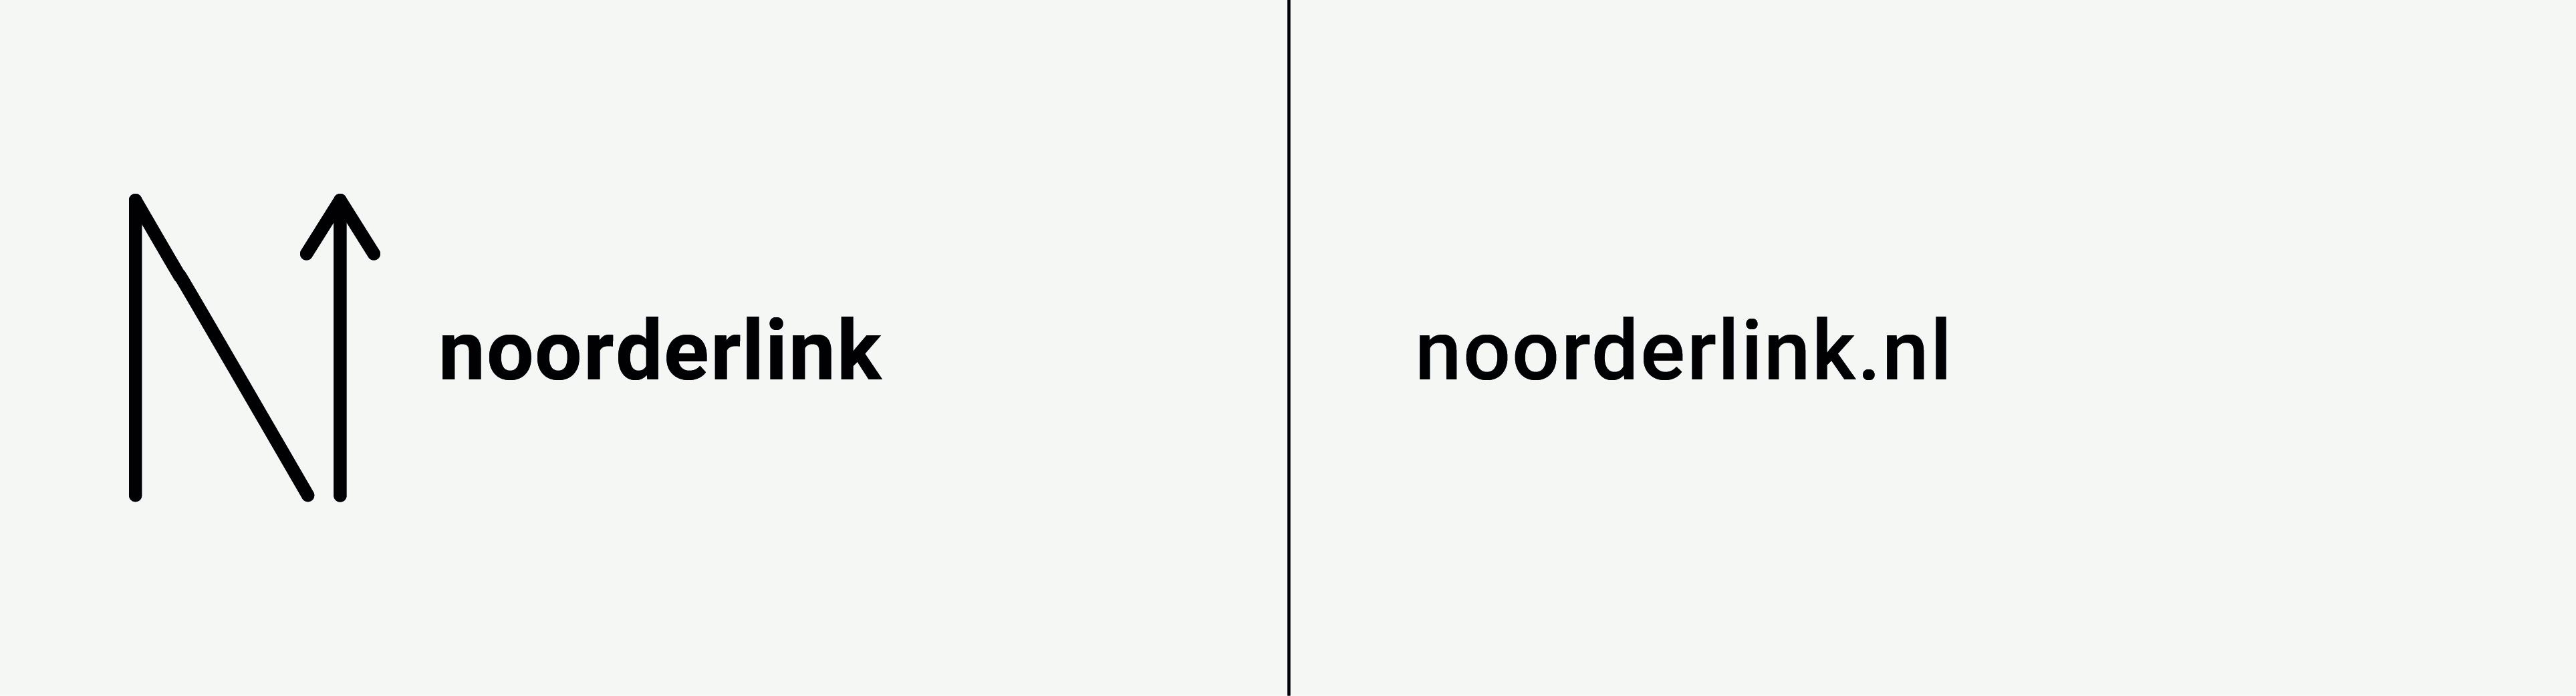 Noorderlink Careers: Lef'L Up! opleidingsprogramma maart 2019